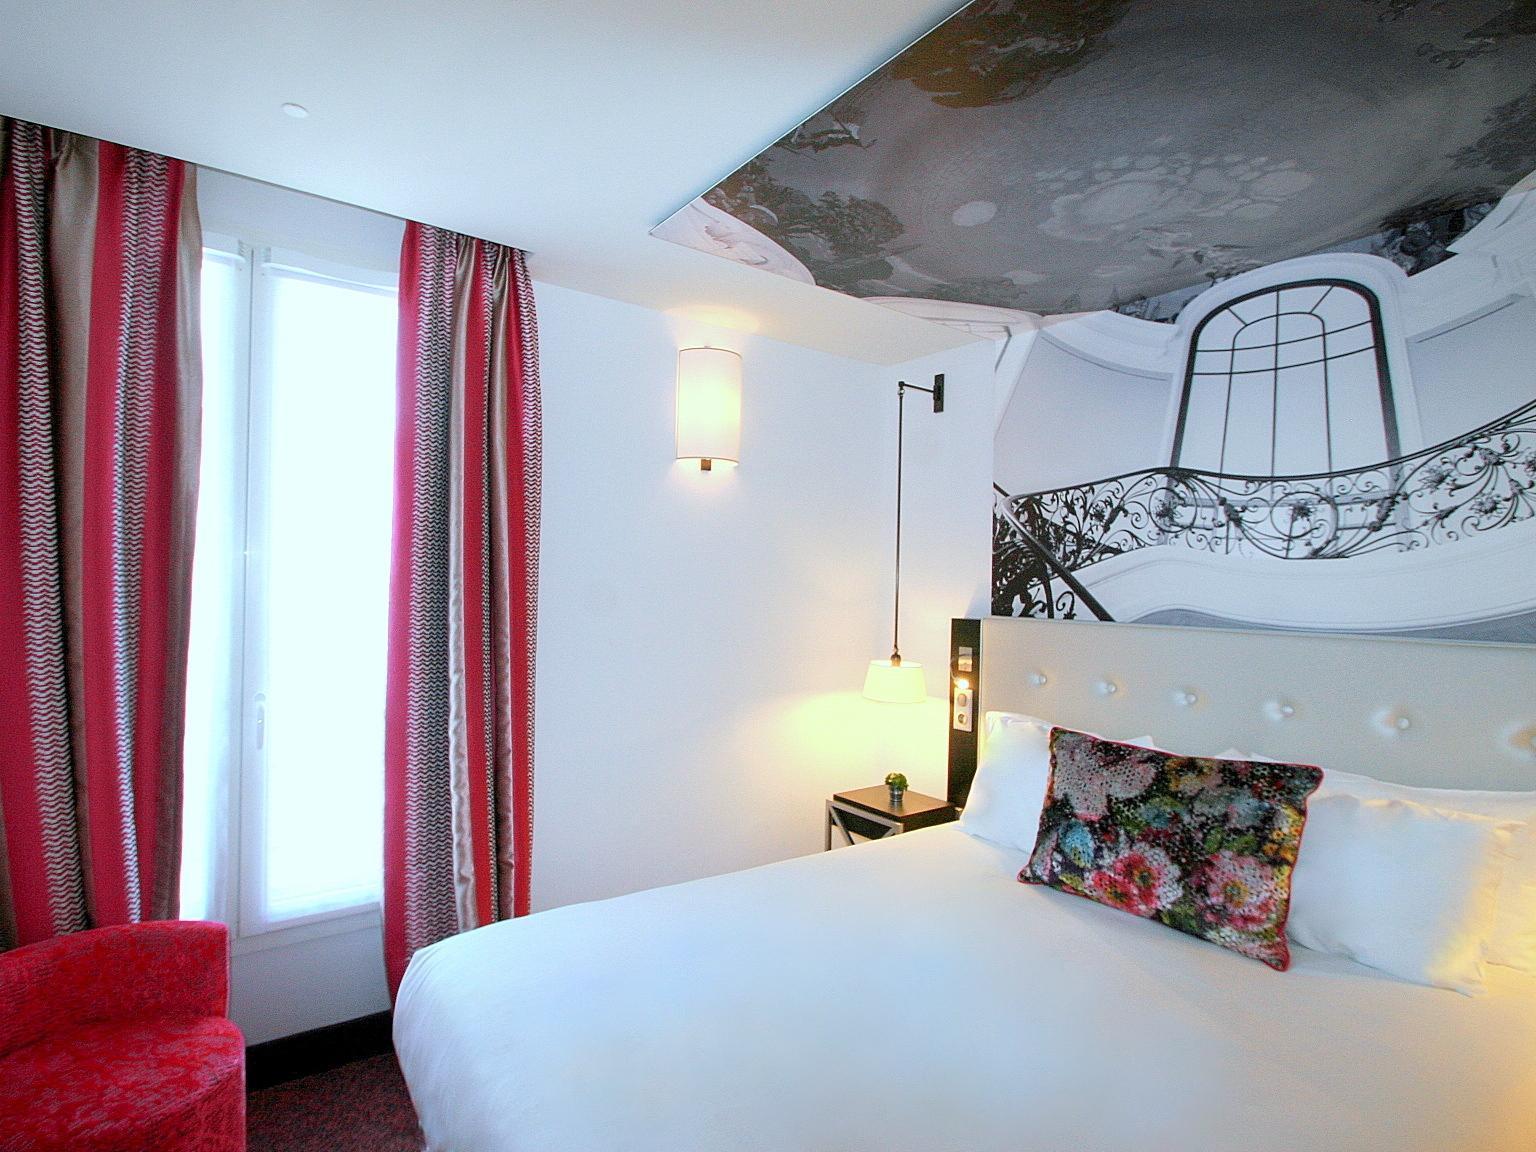 Gustave Hotel - Hotell och Boende i Frankrike i Europa